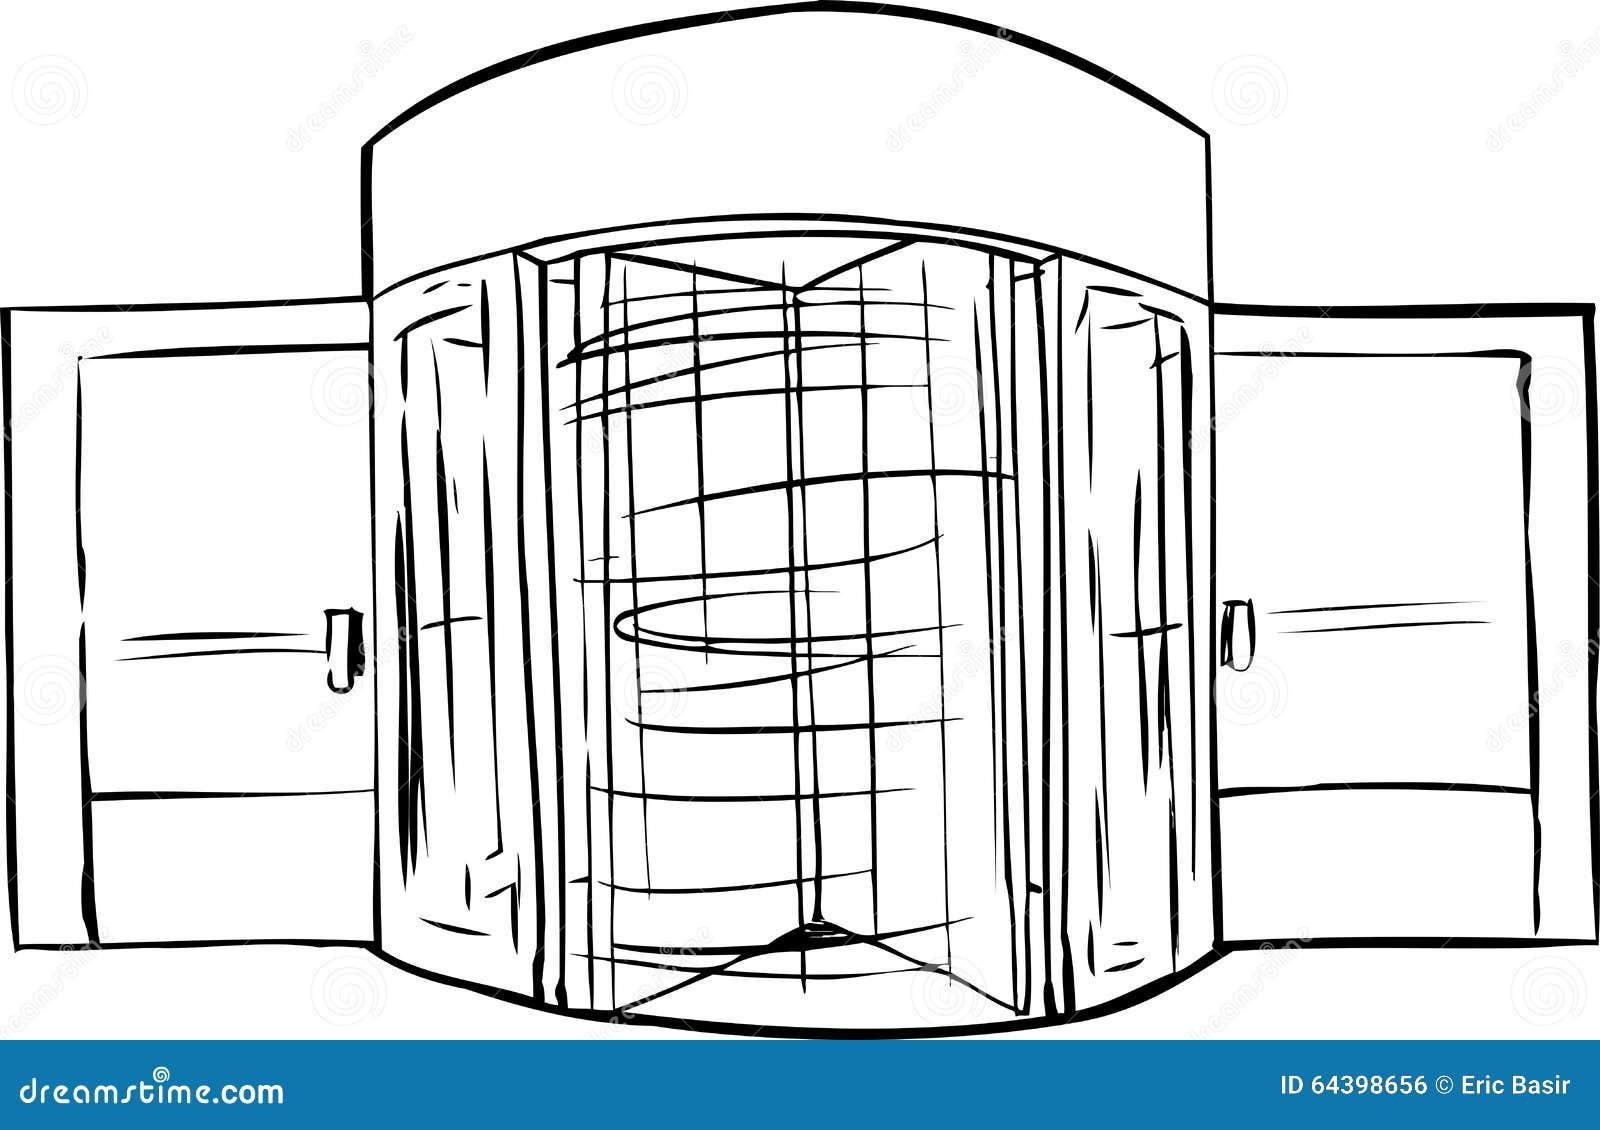 Spinning Revolving Door Outline  sc 1 st  Dreamstime.com & Spinning Revolving Door Outline Stock Illustration - Illustration ...